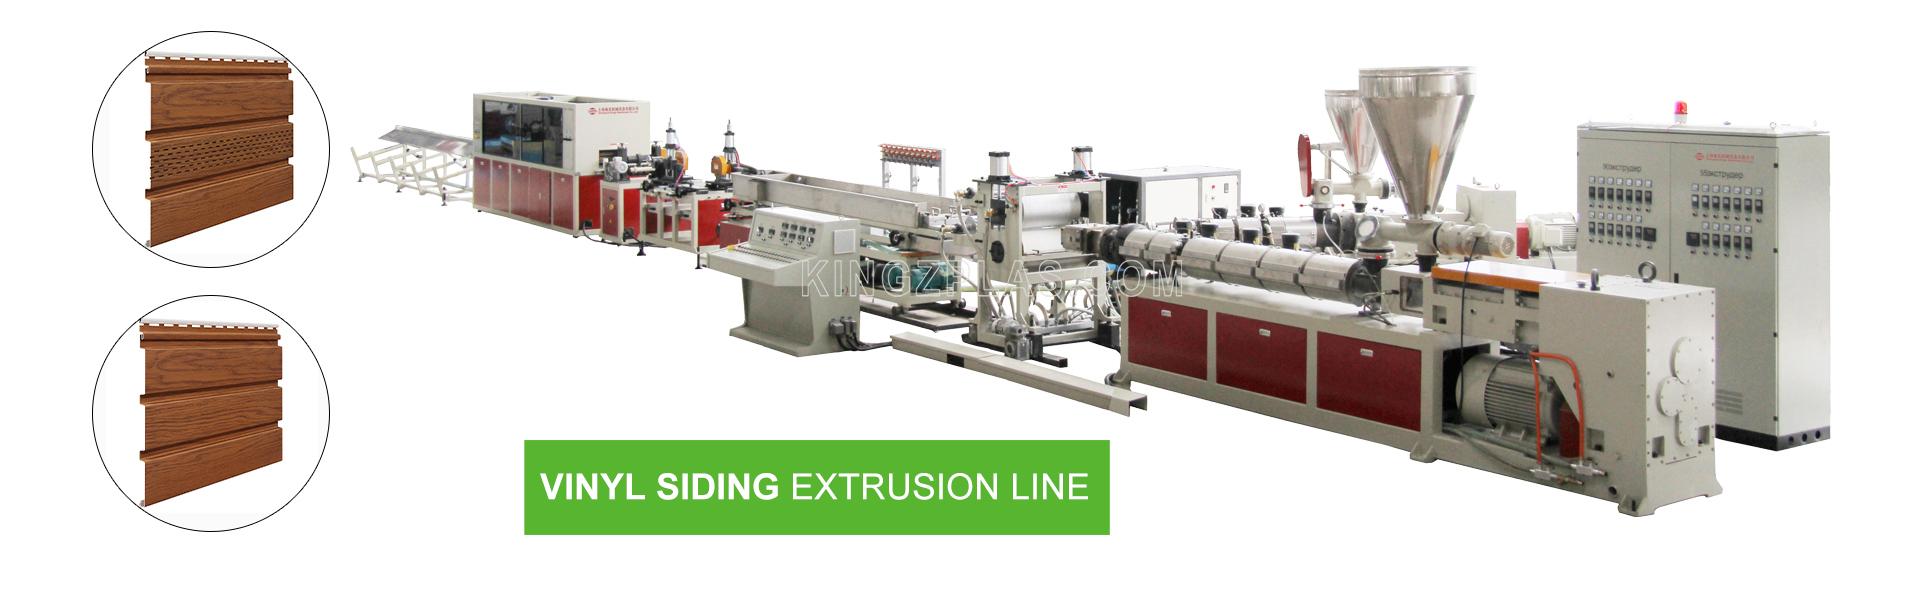 PVC-Siding-Extrusion-Line-Kingz-Machinery